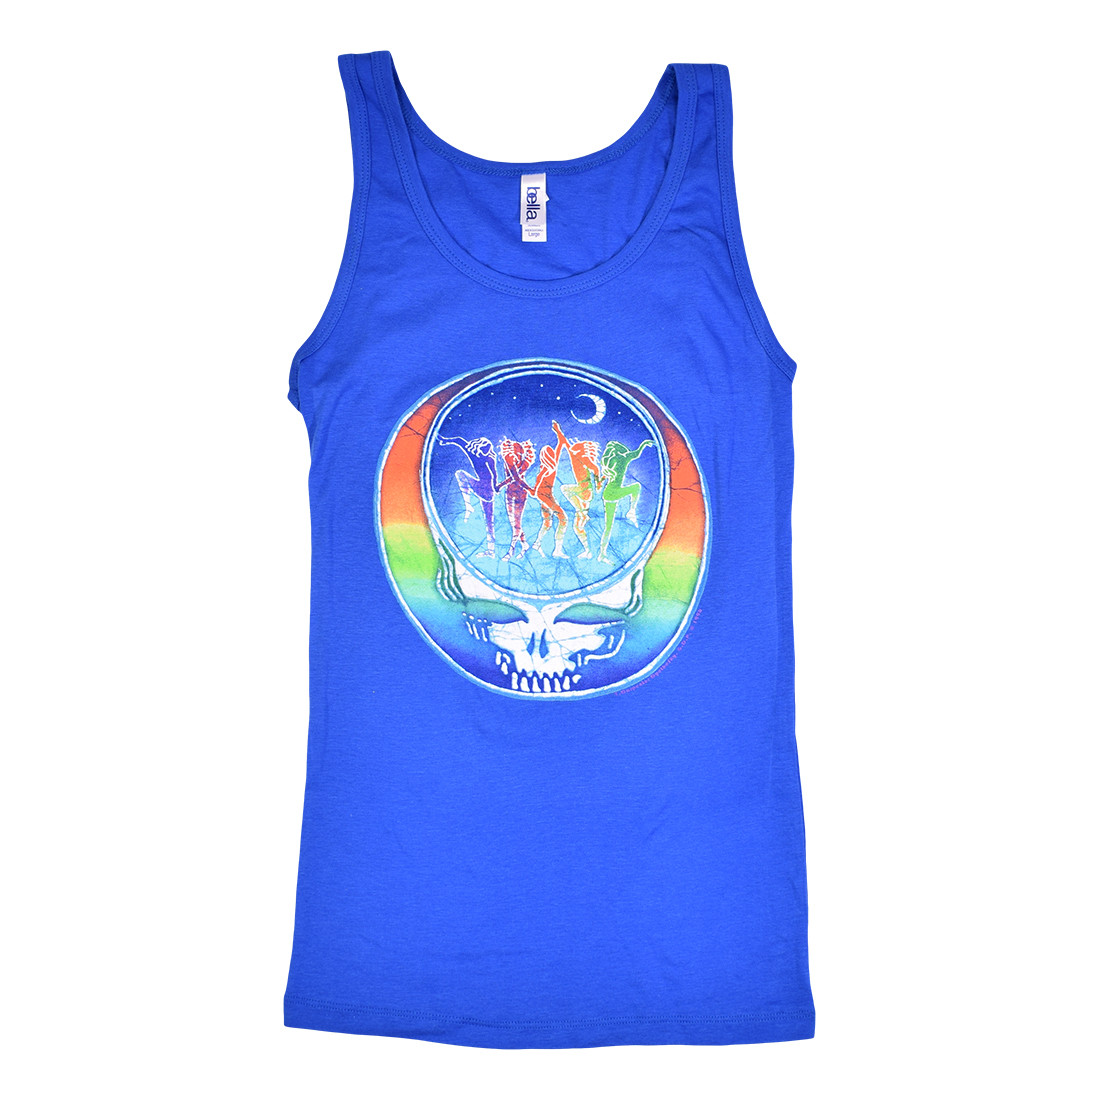 GD Dancing Face Blue Juniors Tank Top T-Shirt